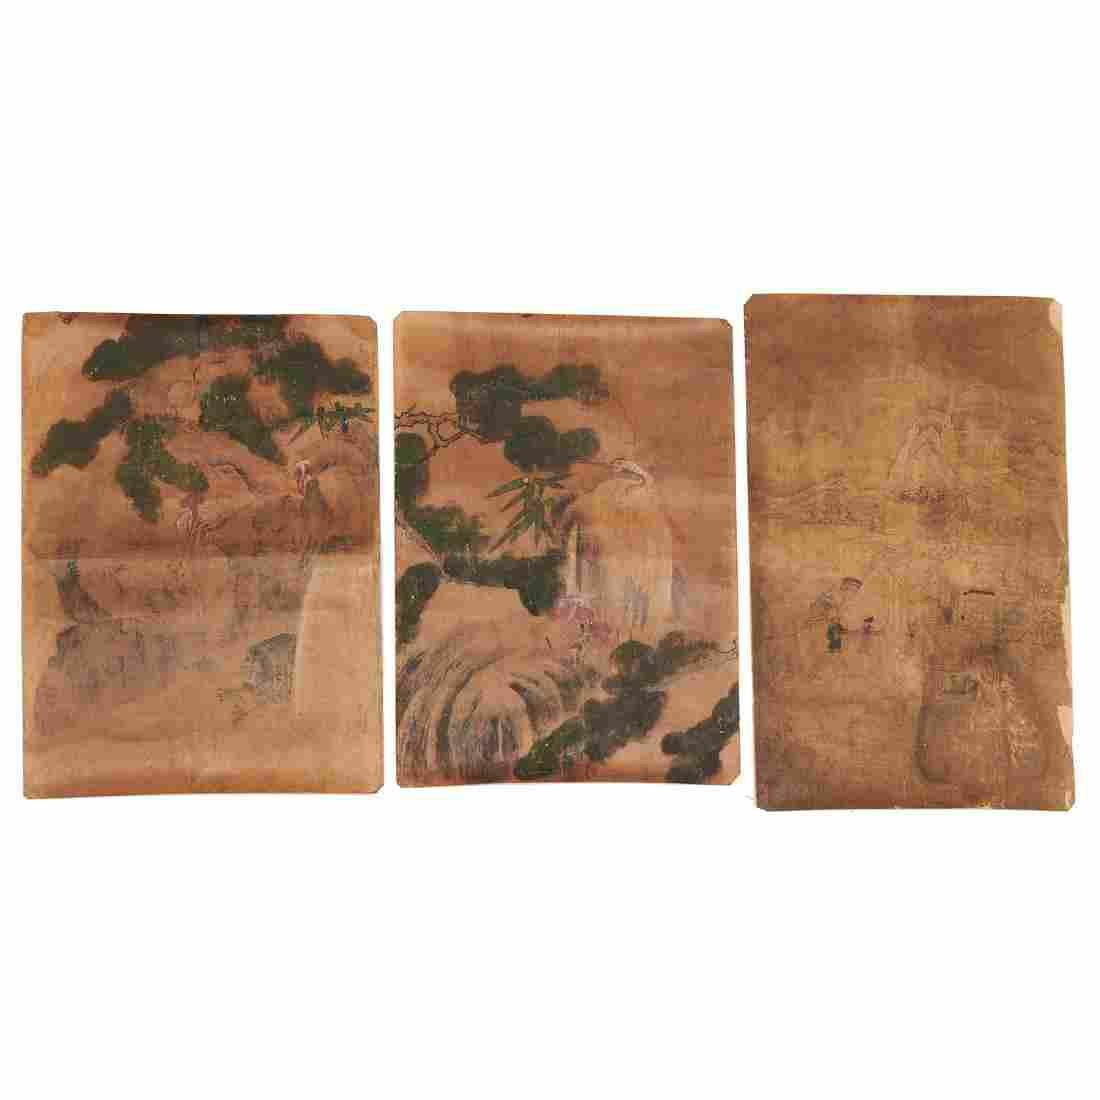 Chinese School, (3) paintings